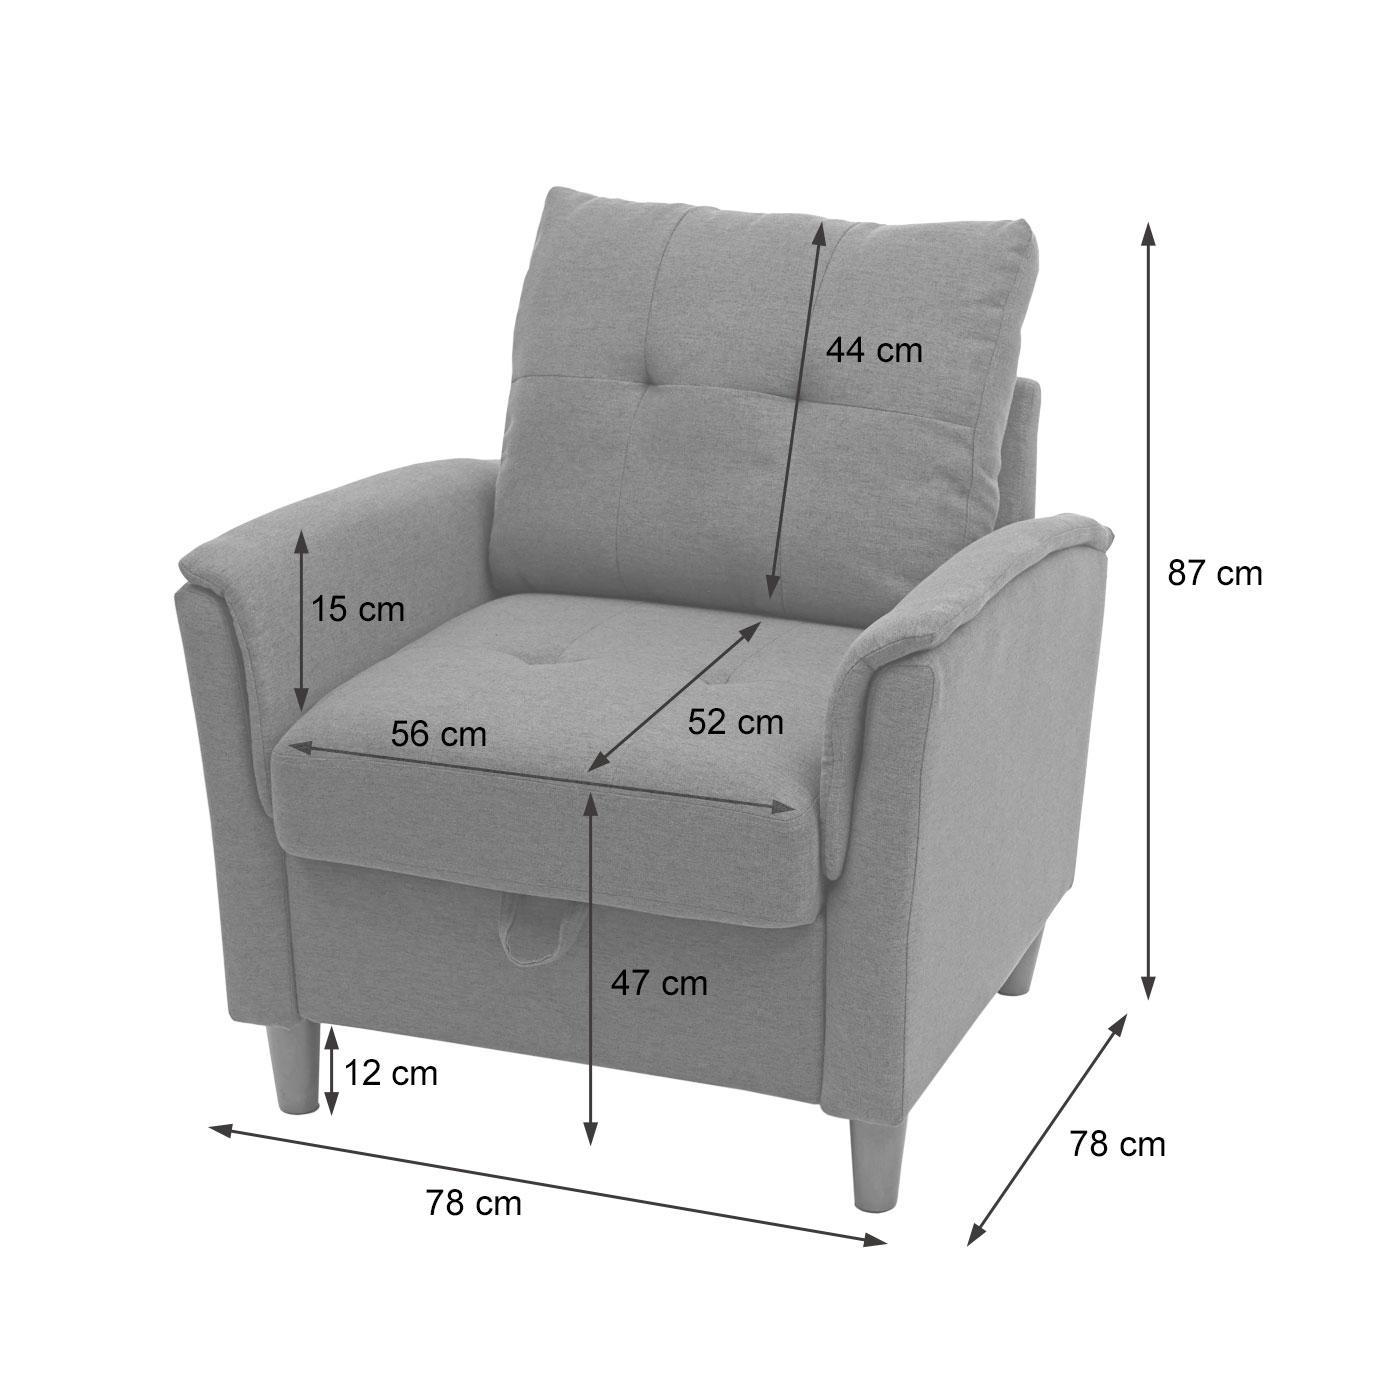 HWC-H23 Sessel Bemaßungsbild